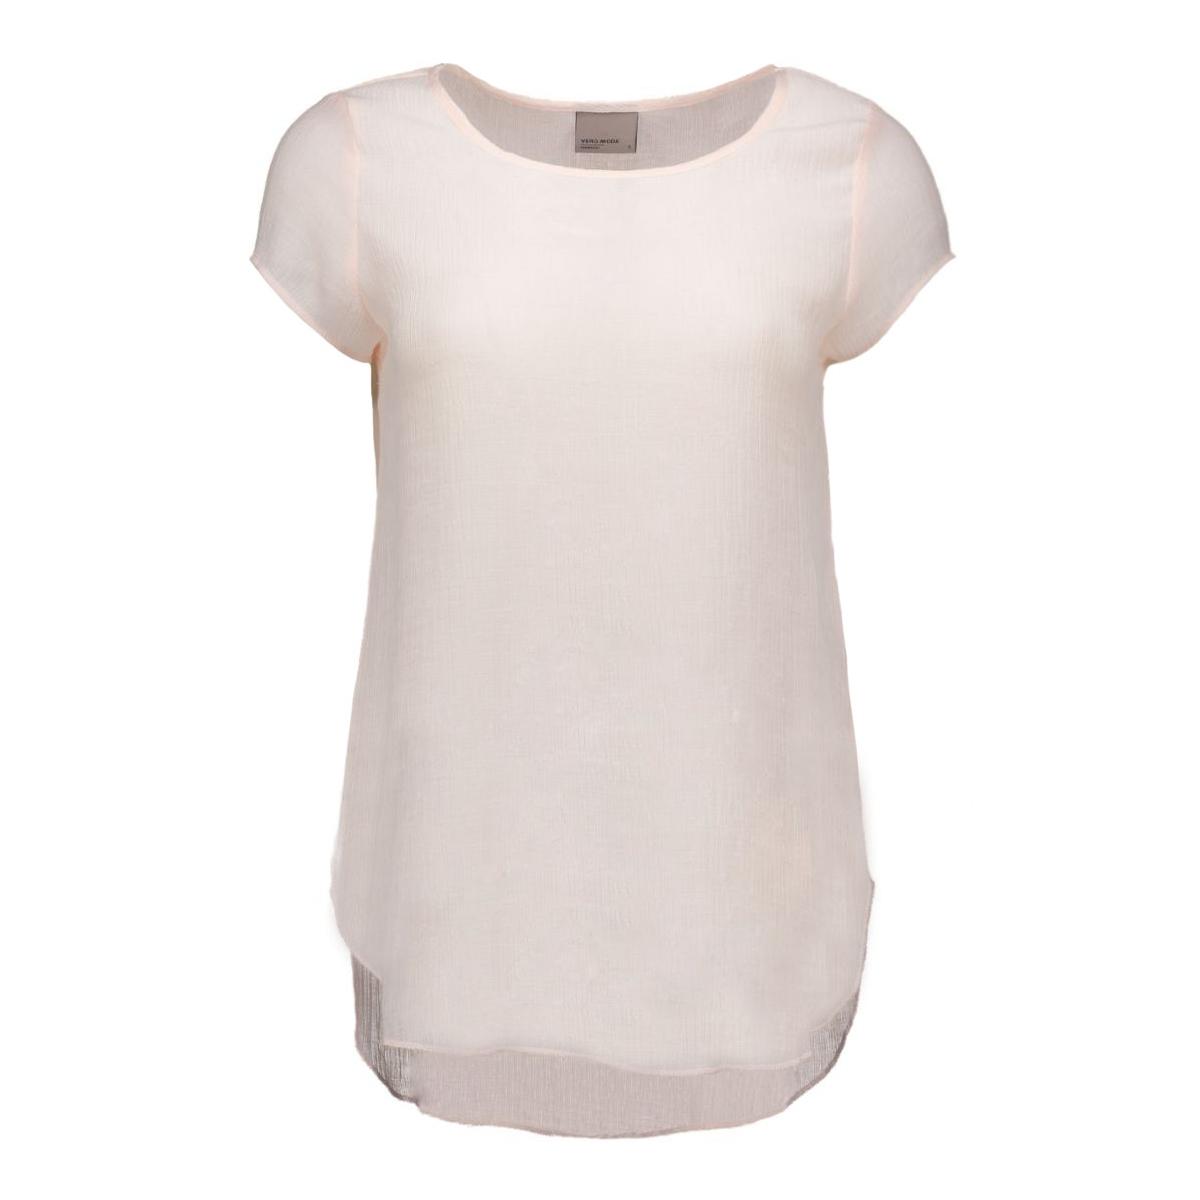 vmboca summer blouse 10146197 vero moda t-shirt pearl